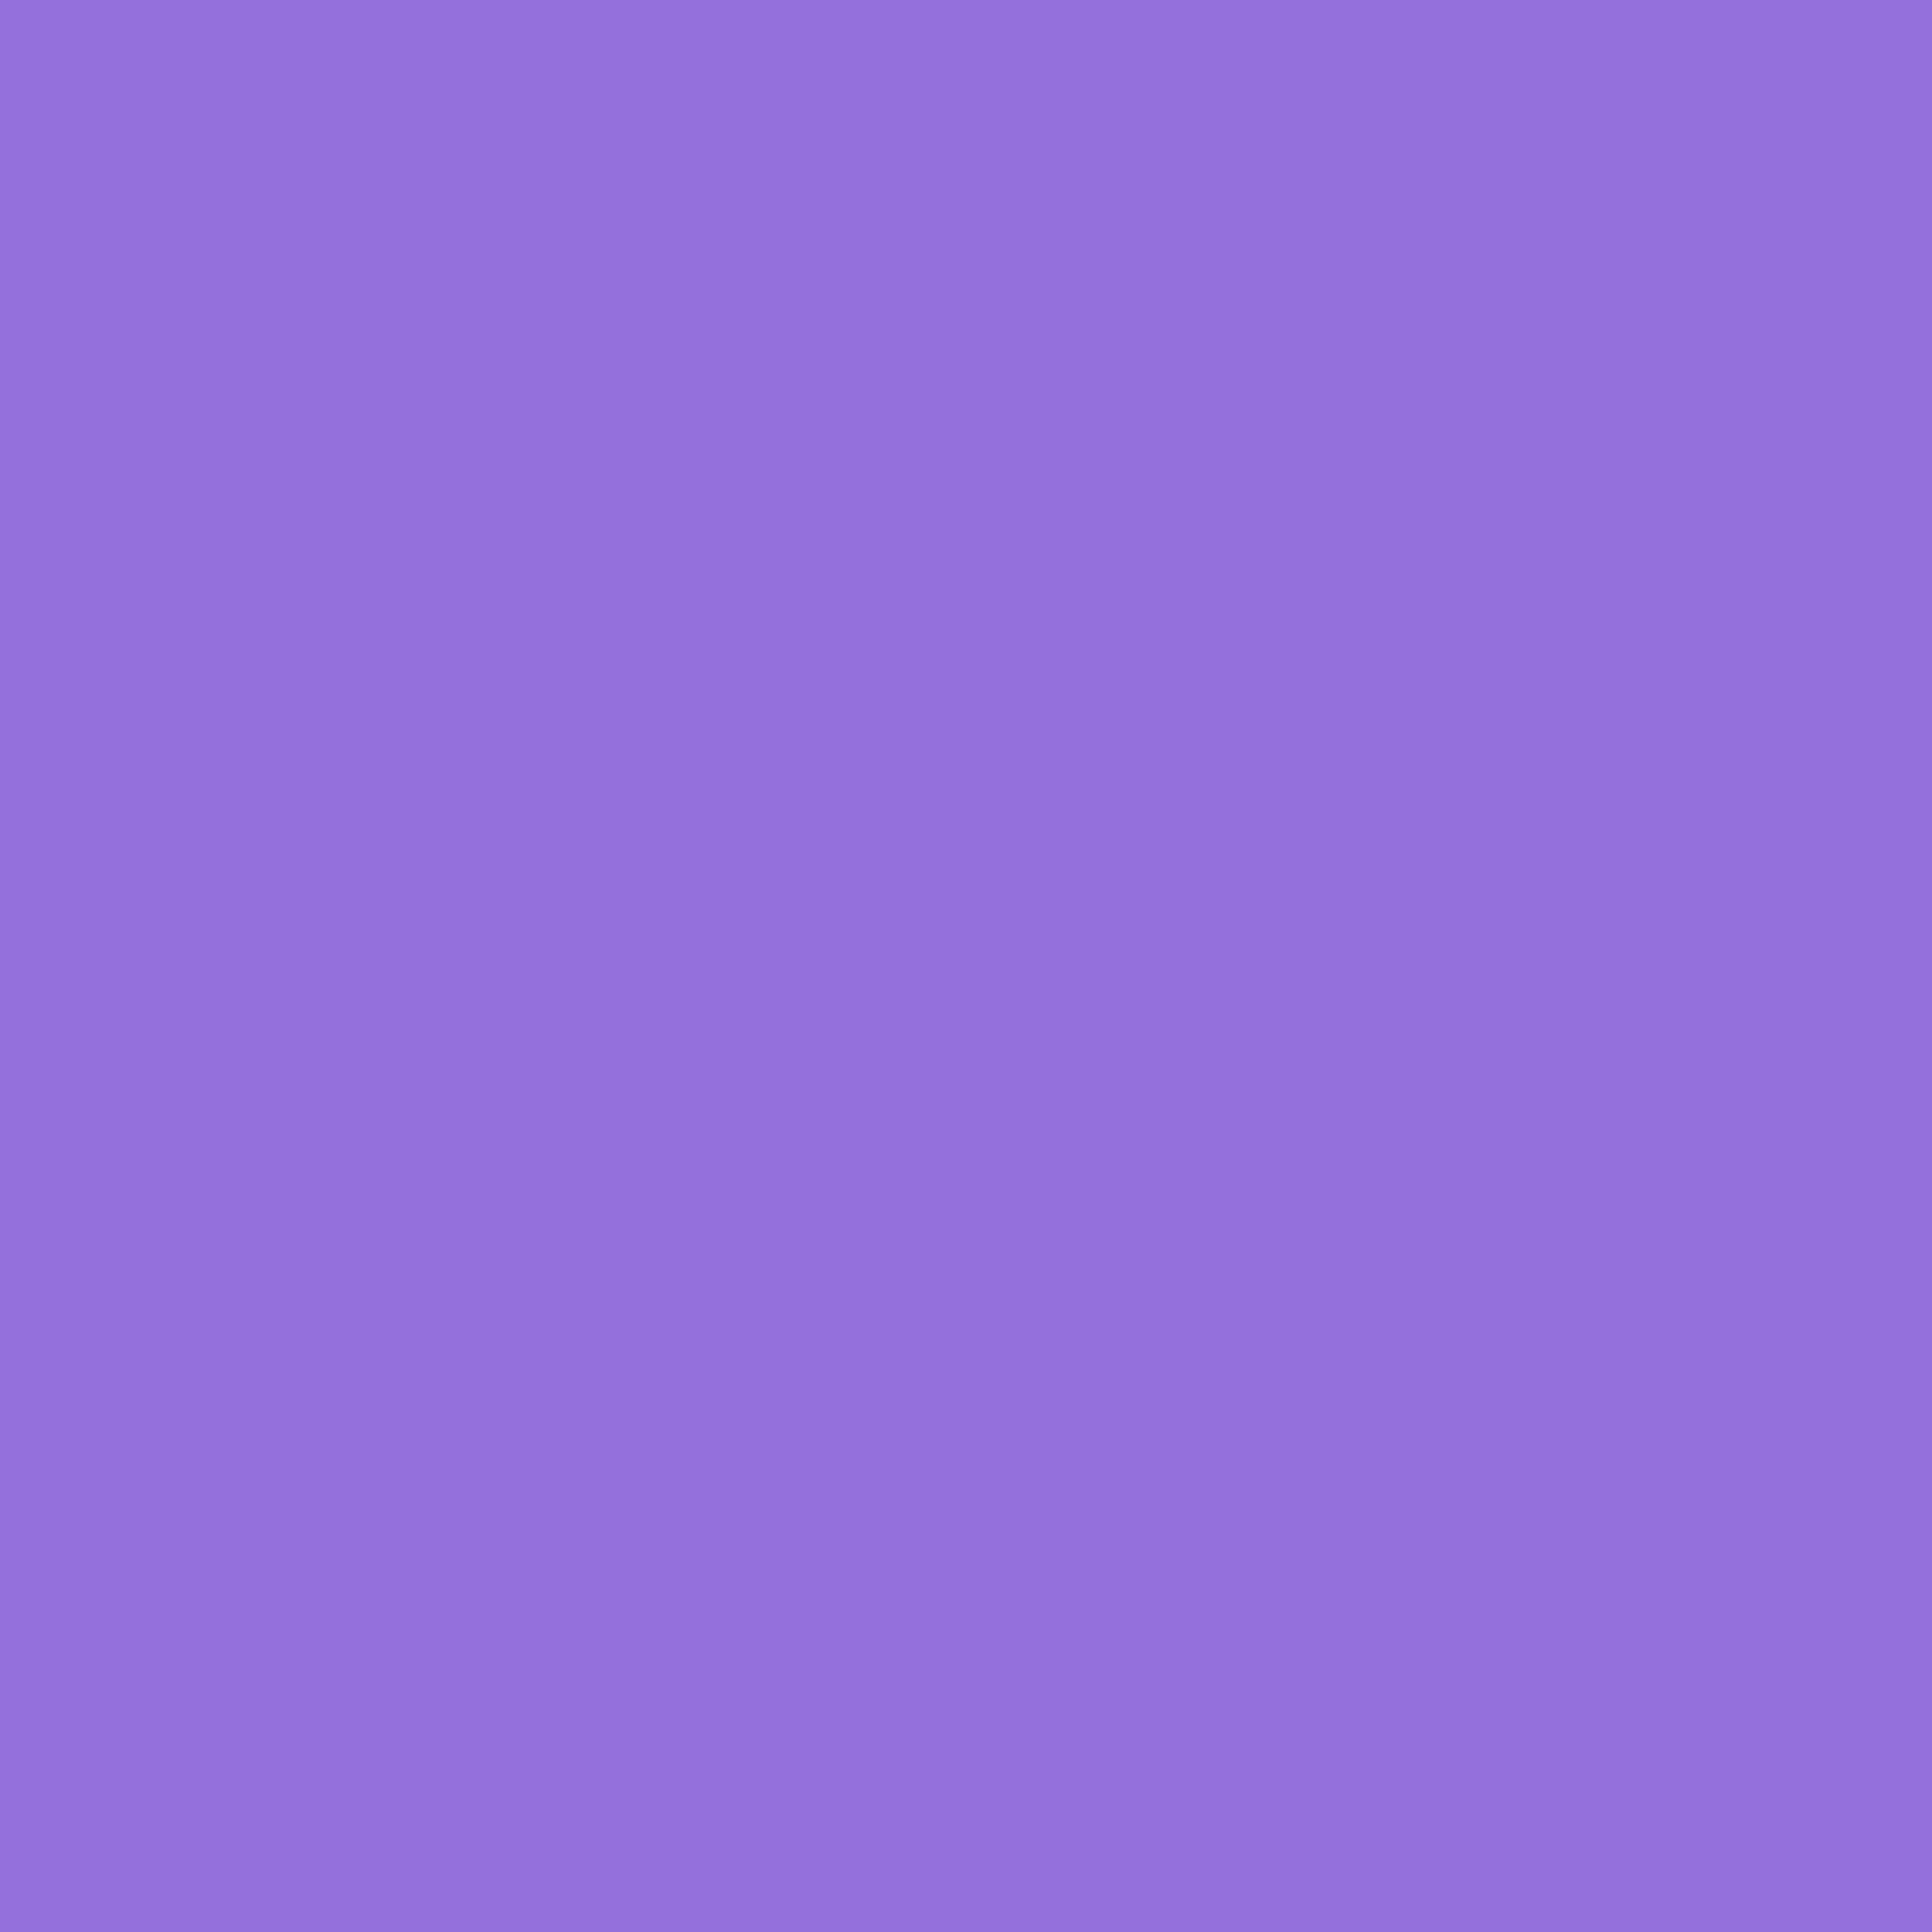 2048x2048 Medium Purple Solid Color Background